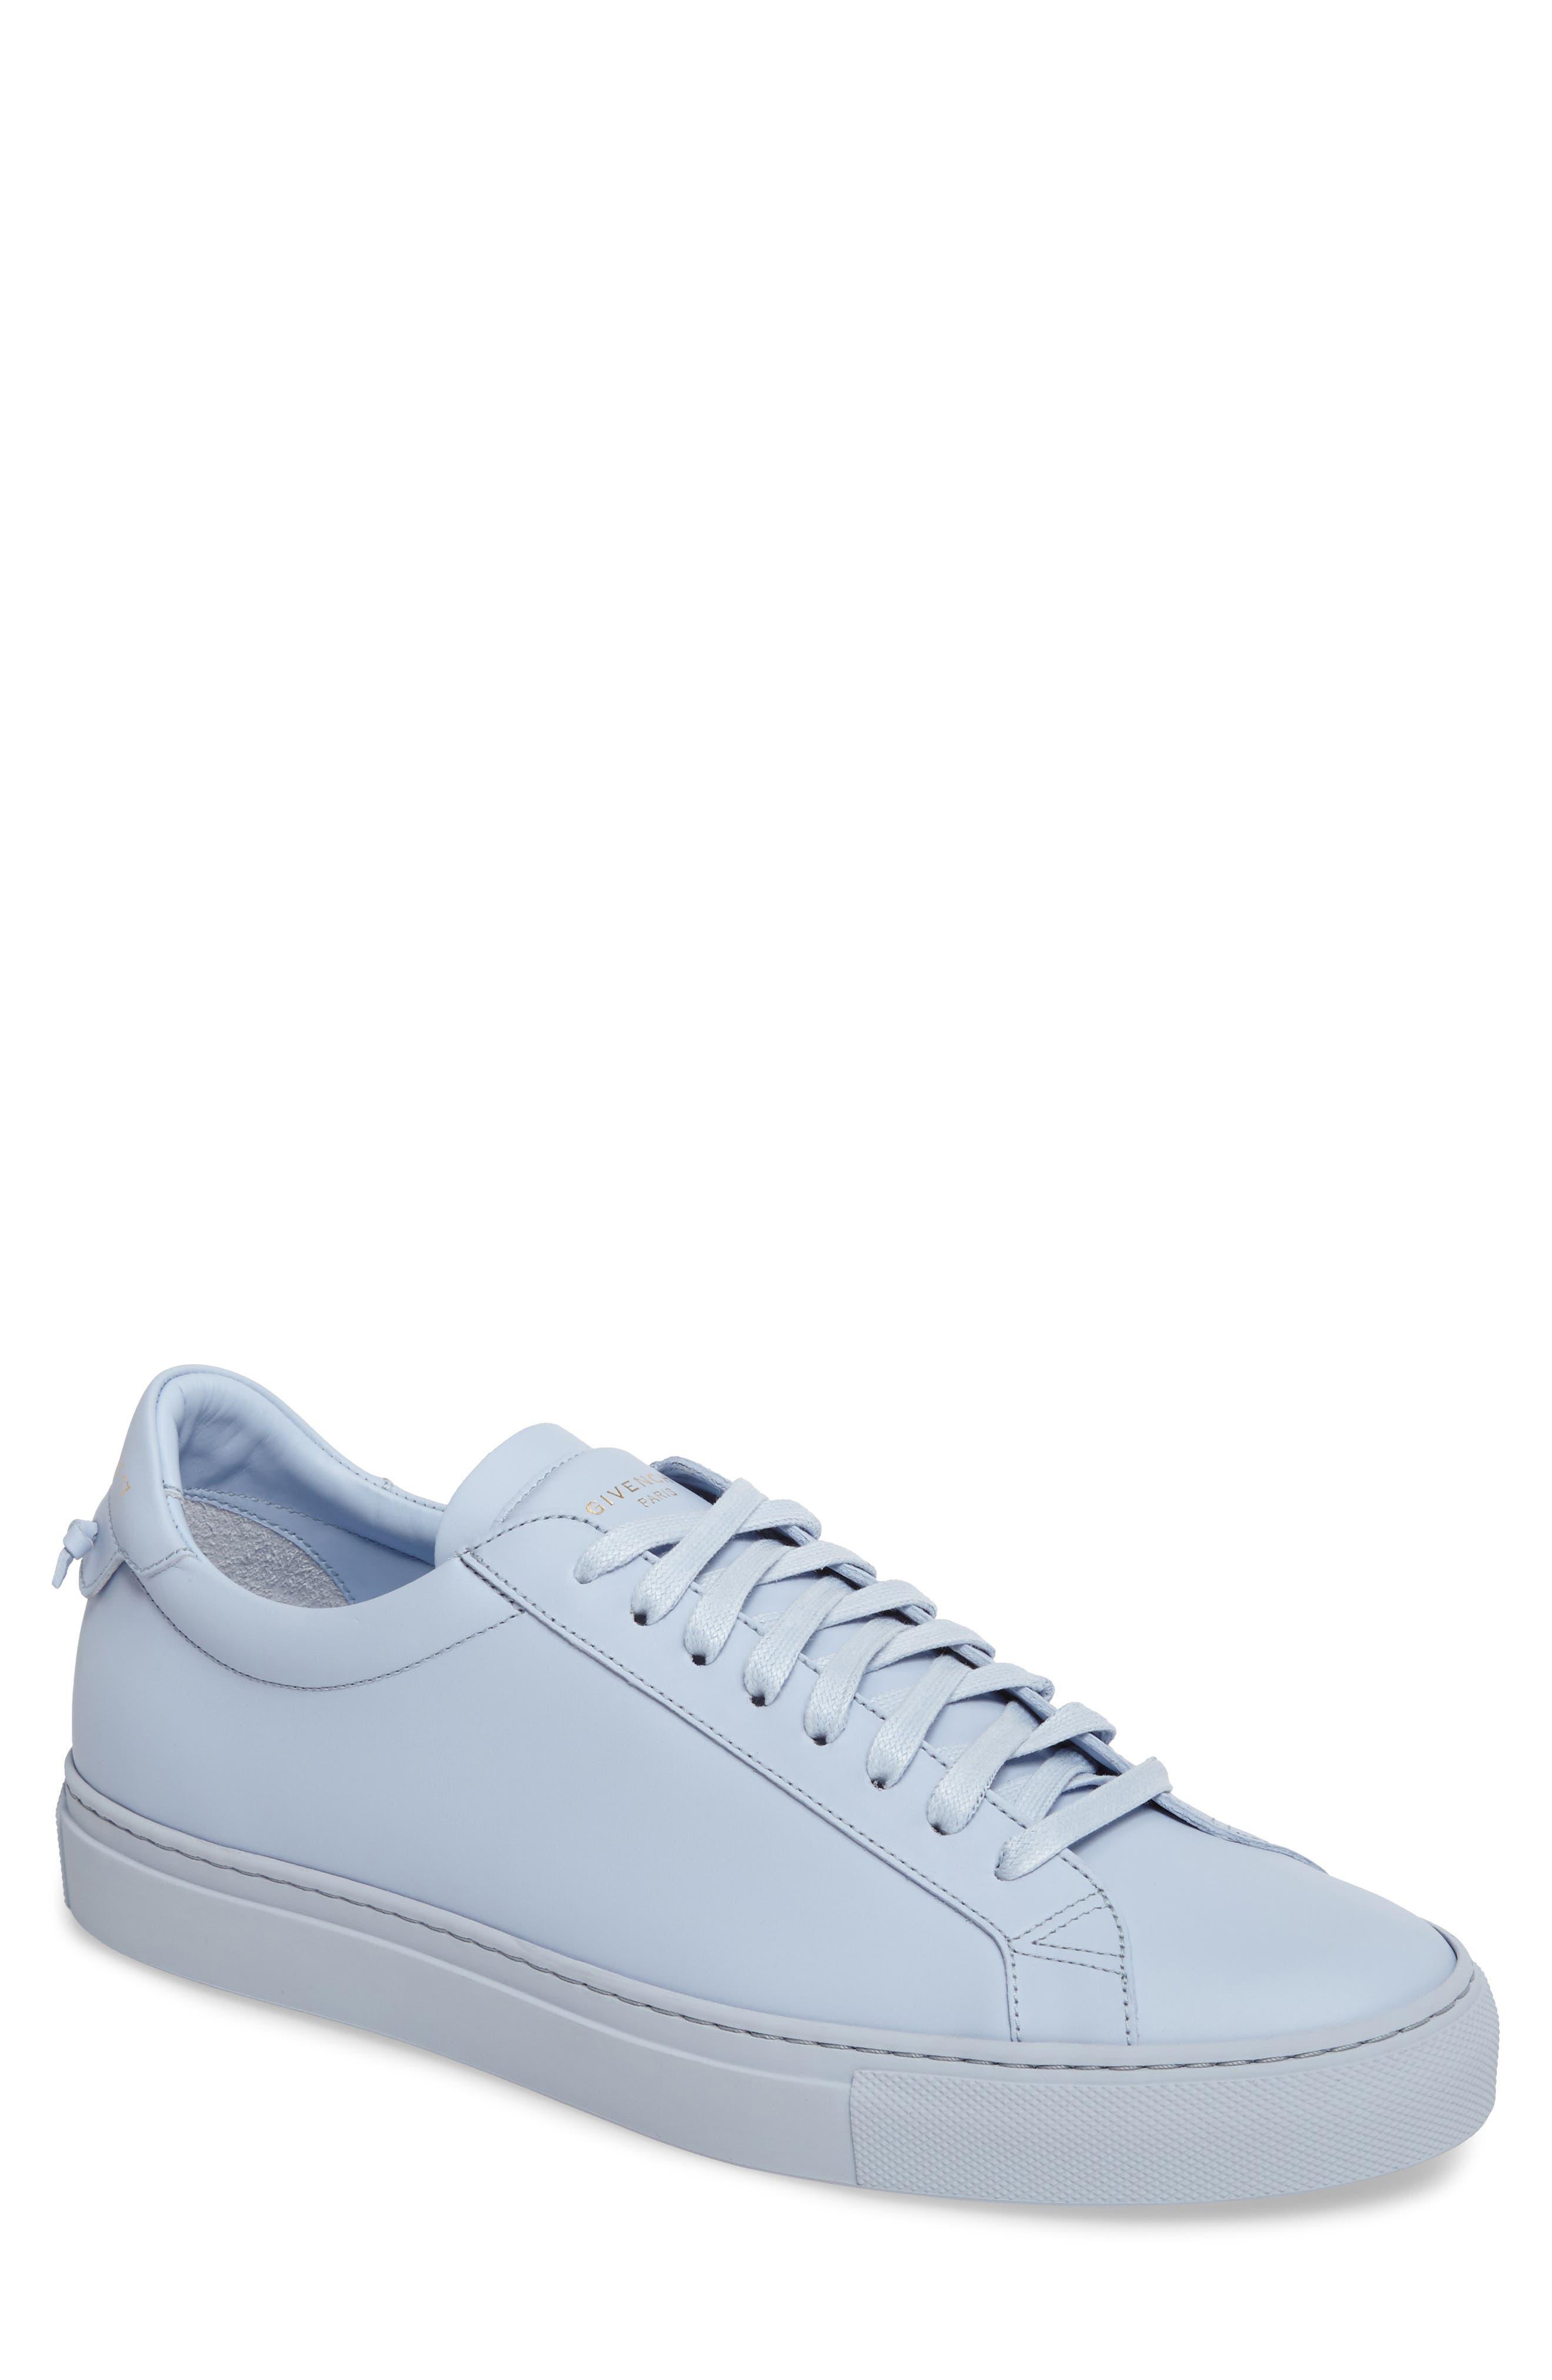 GIVENCHY Urban Knots Lo Sneaker